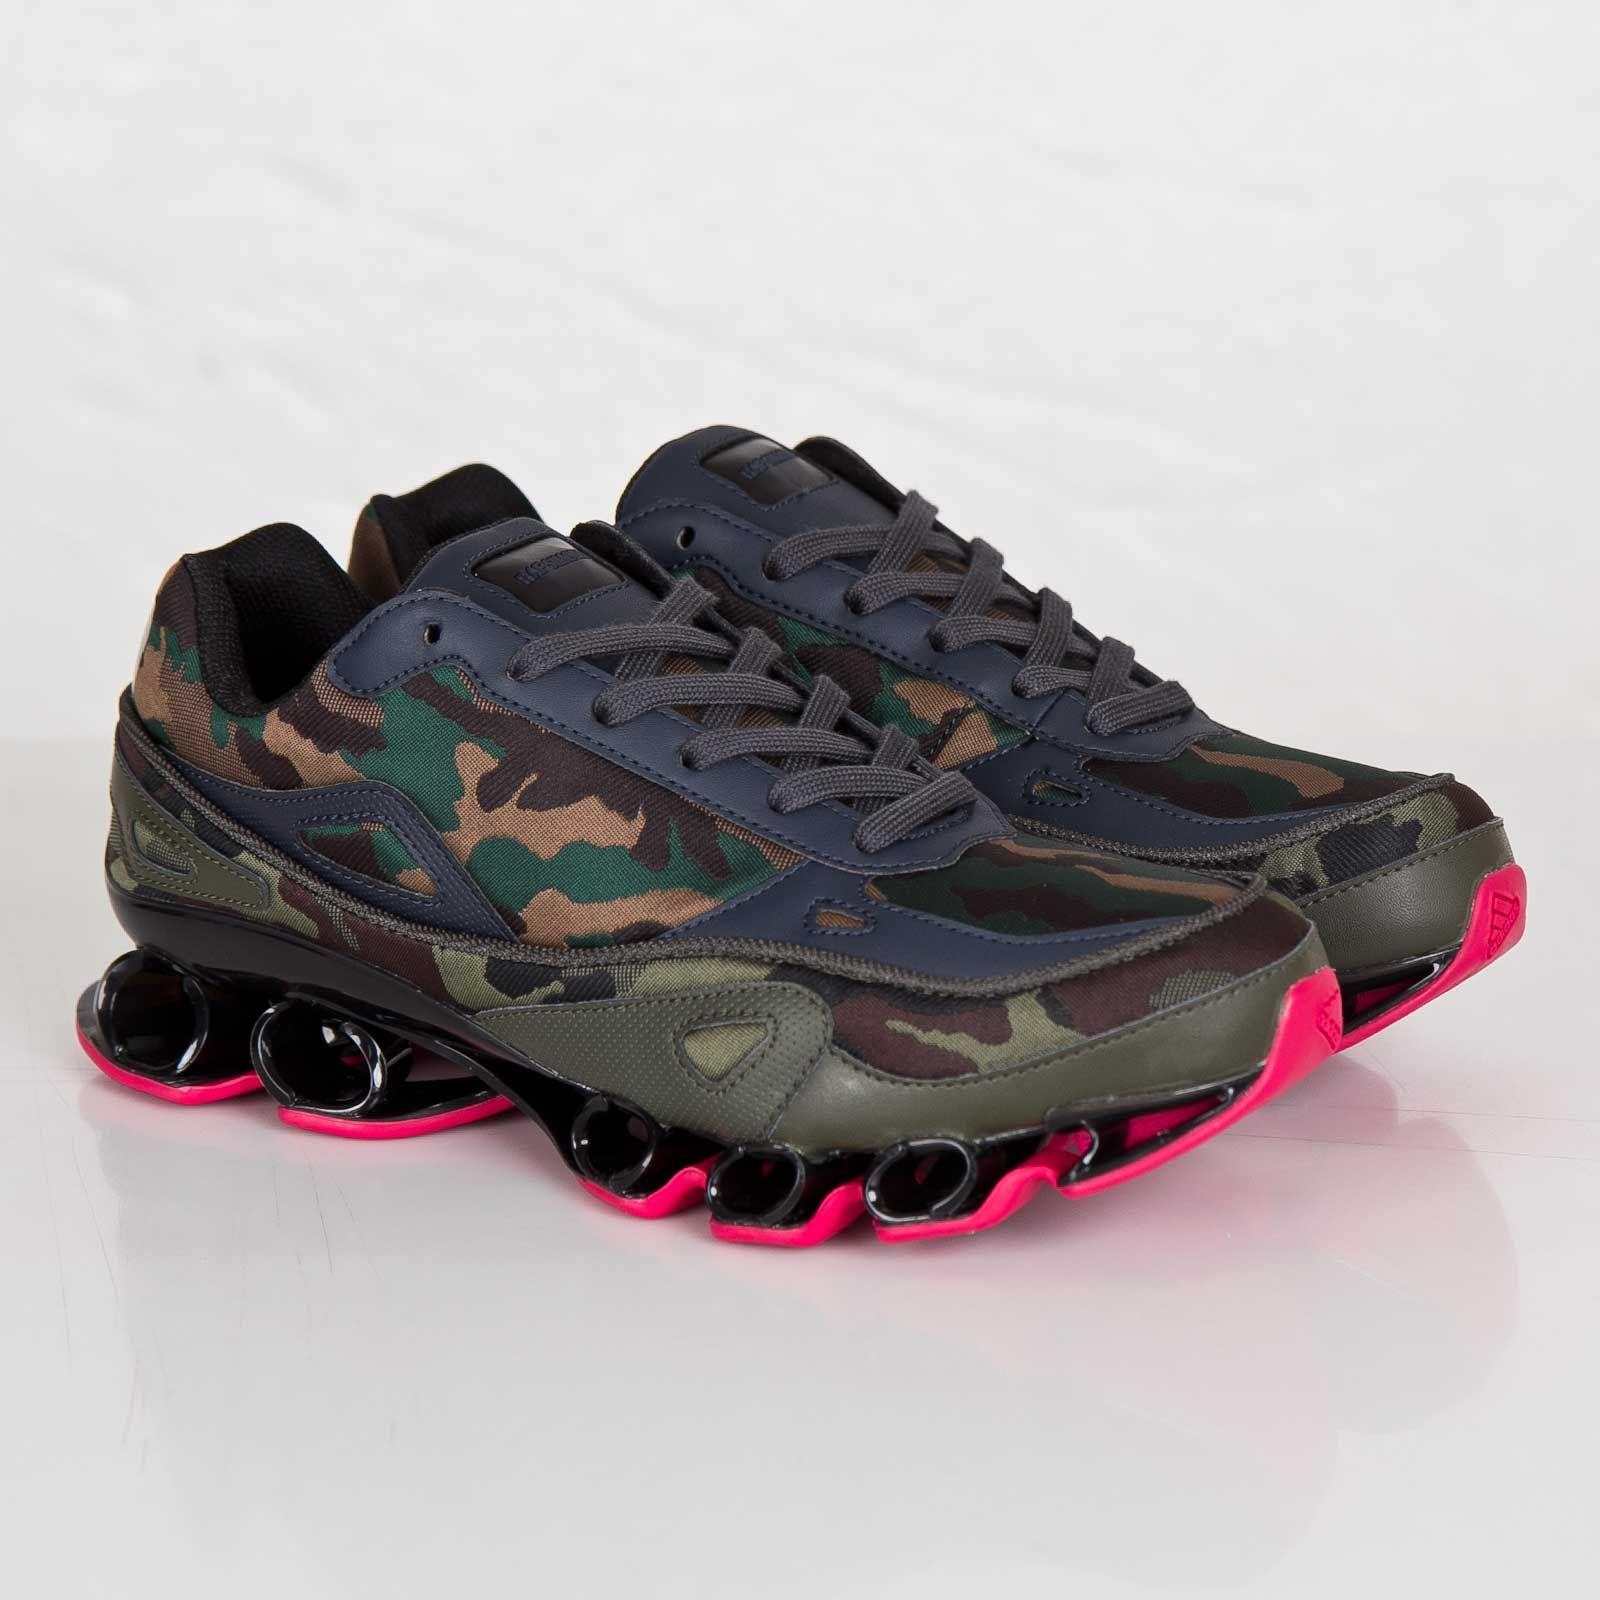 Adidas x Raf Simons bounce sneakers